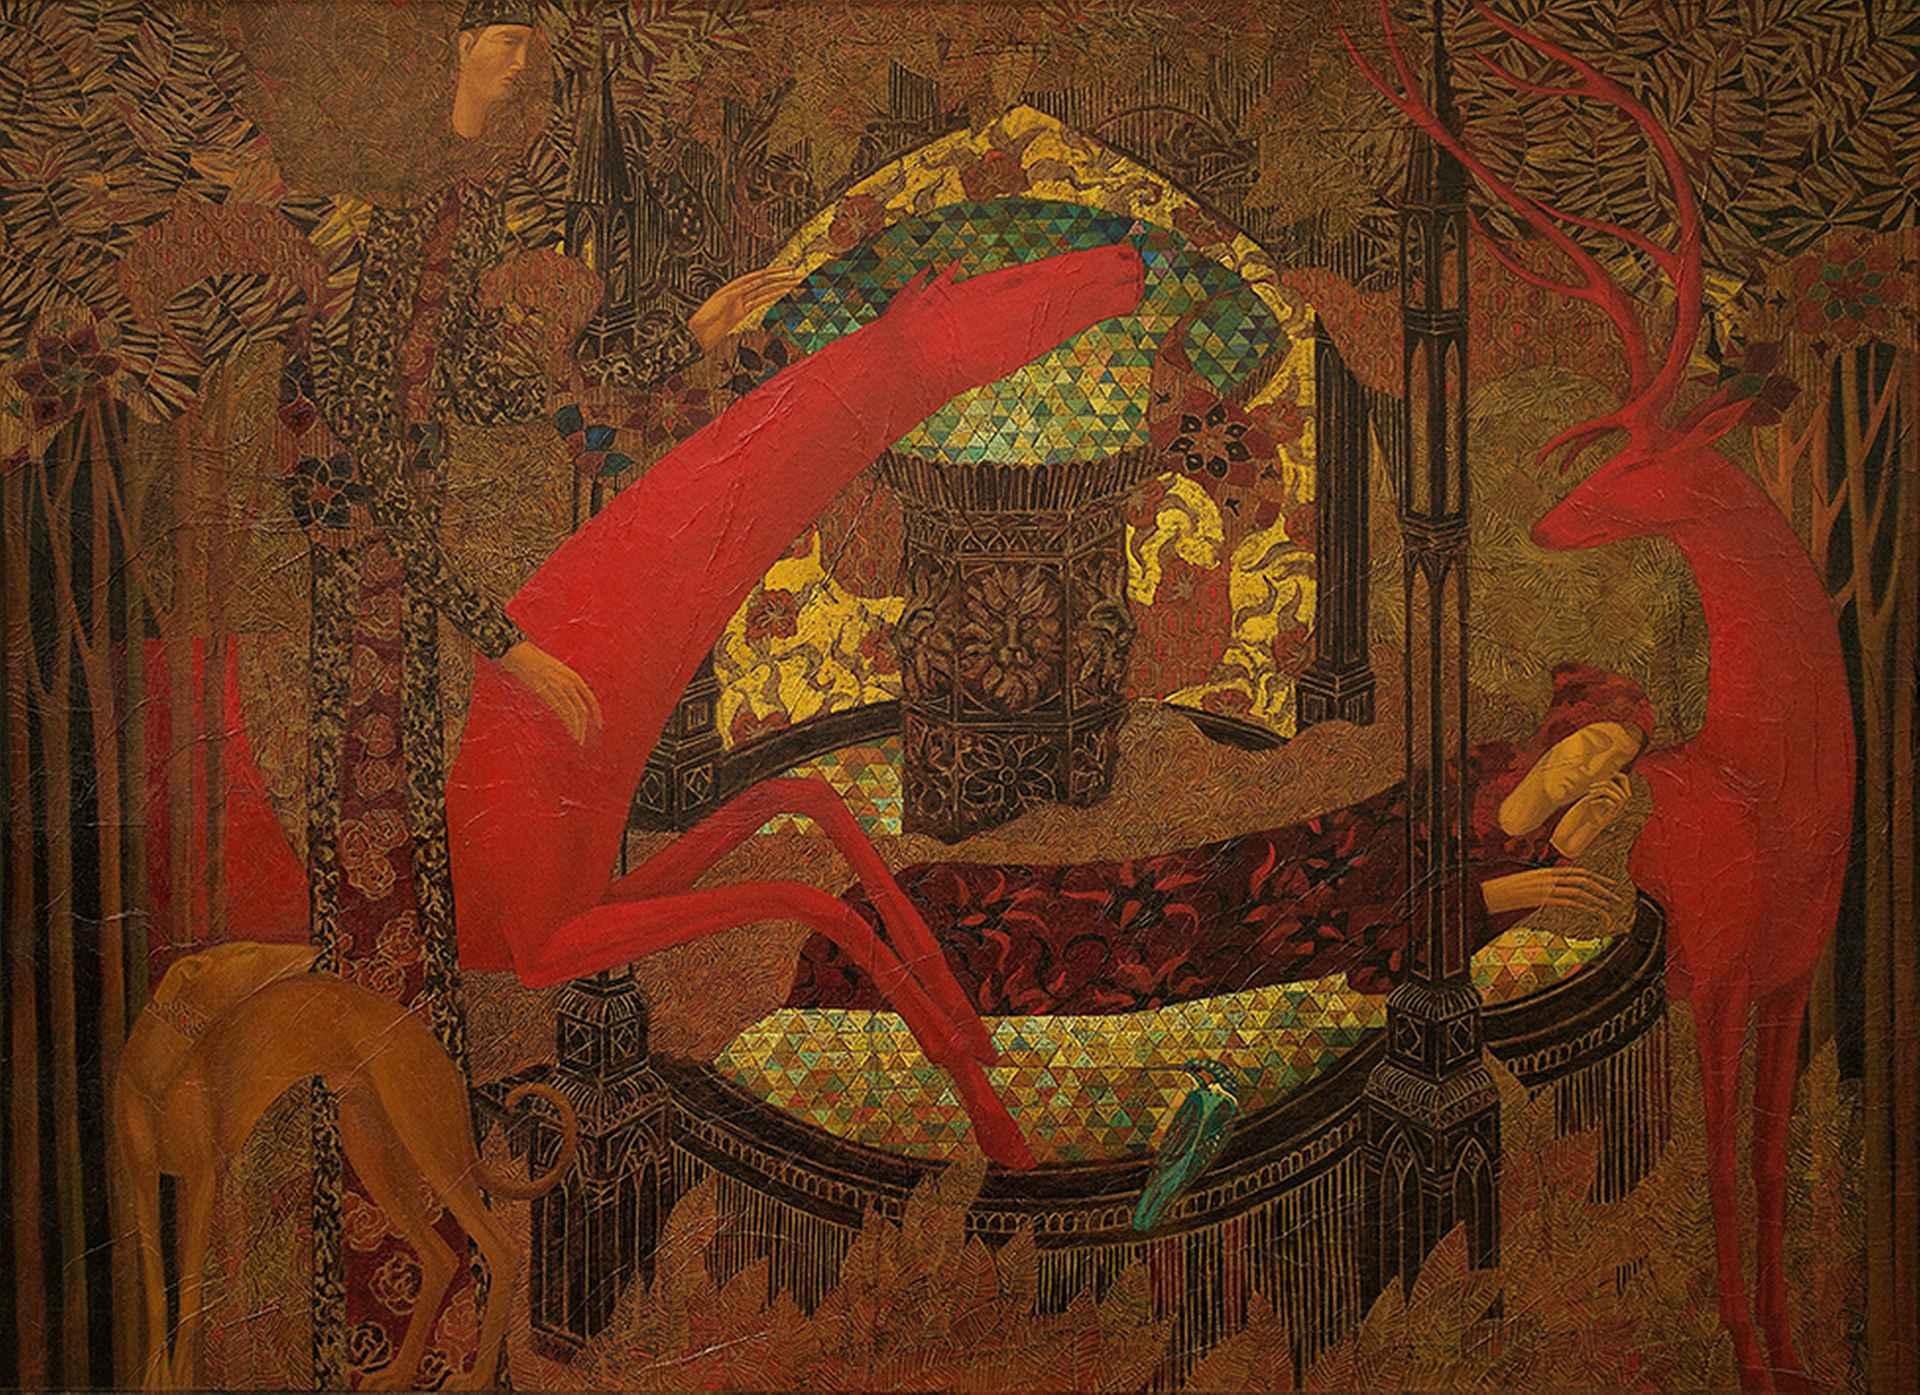 Fisher King (Roi Pecheur) by Timur D'Vatz